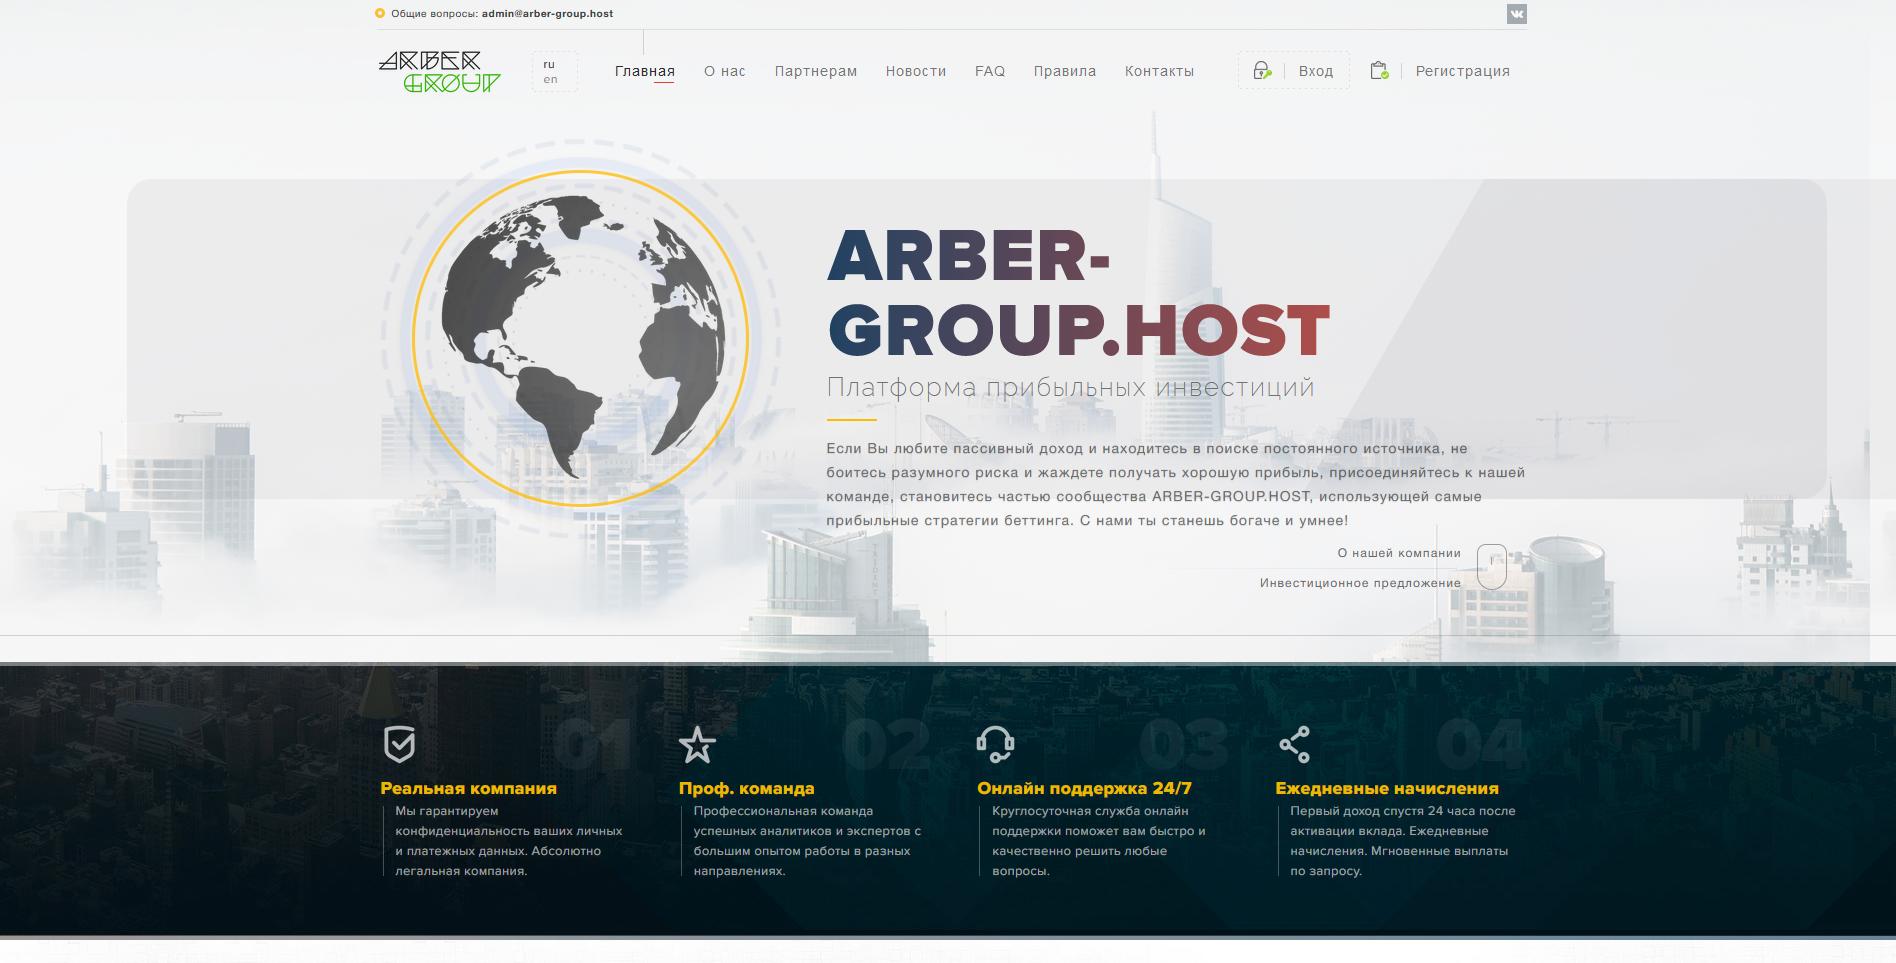 ARBER-GROUP